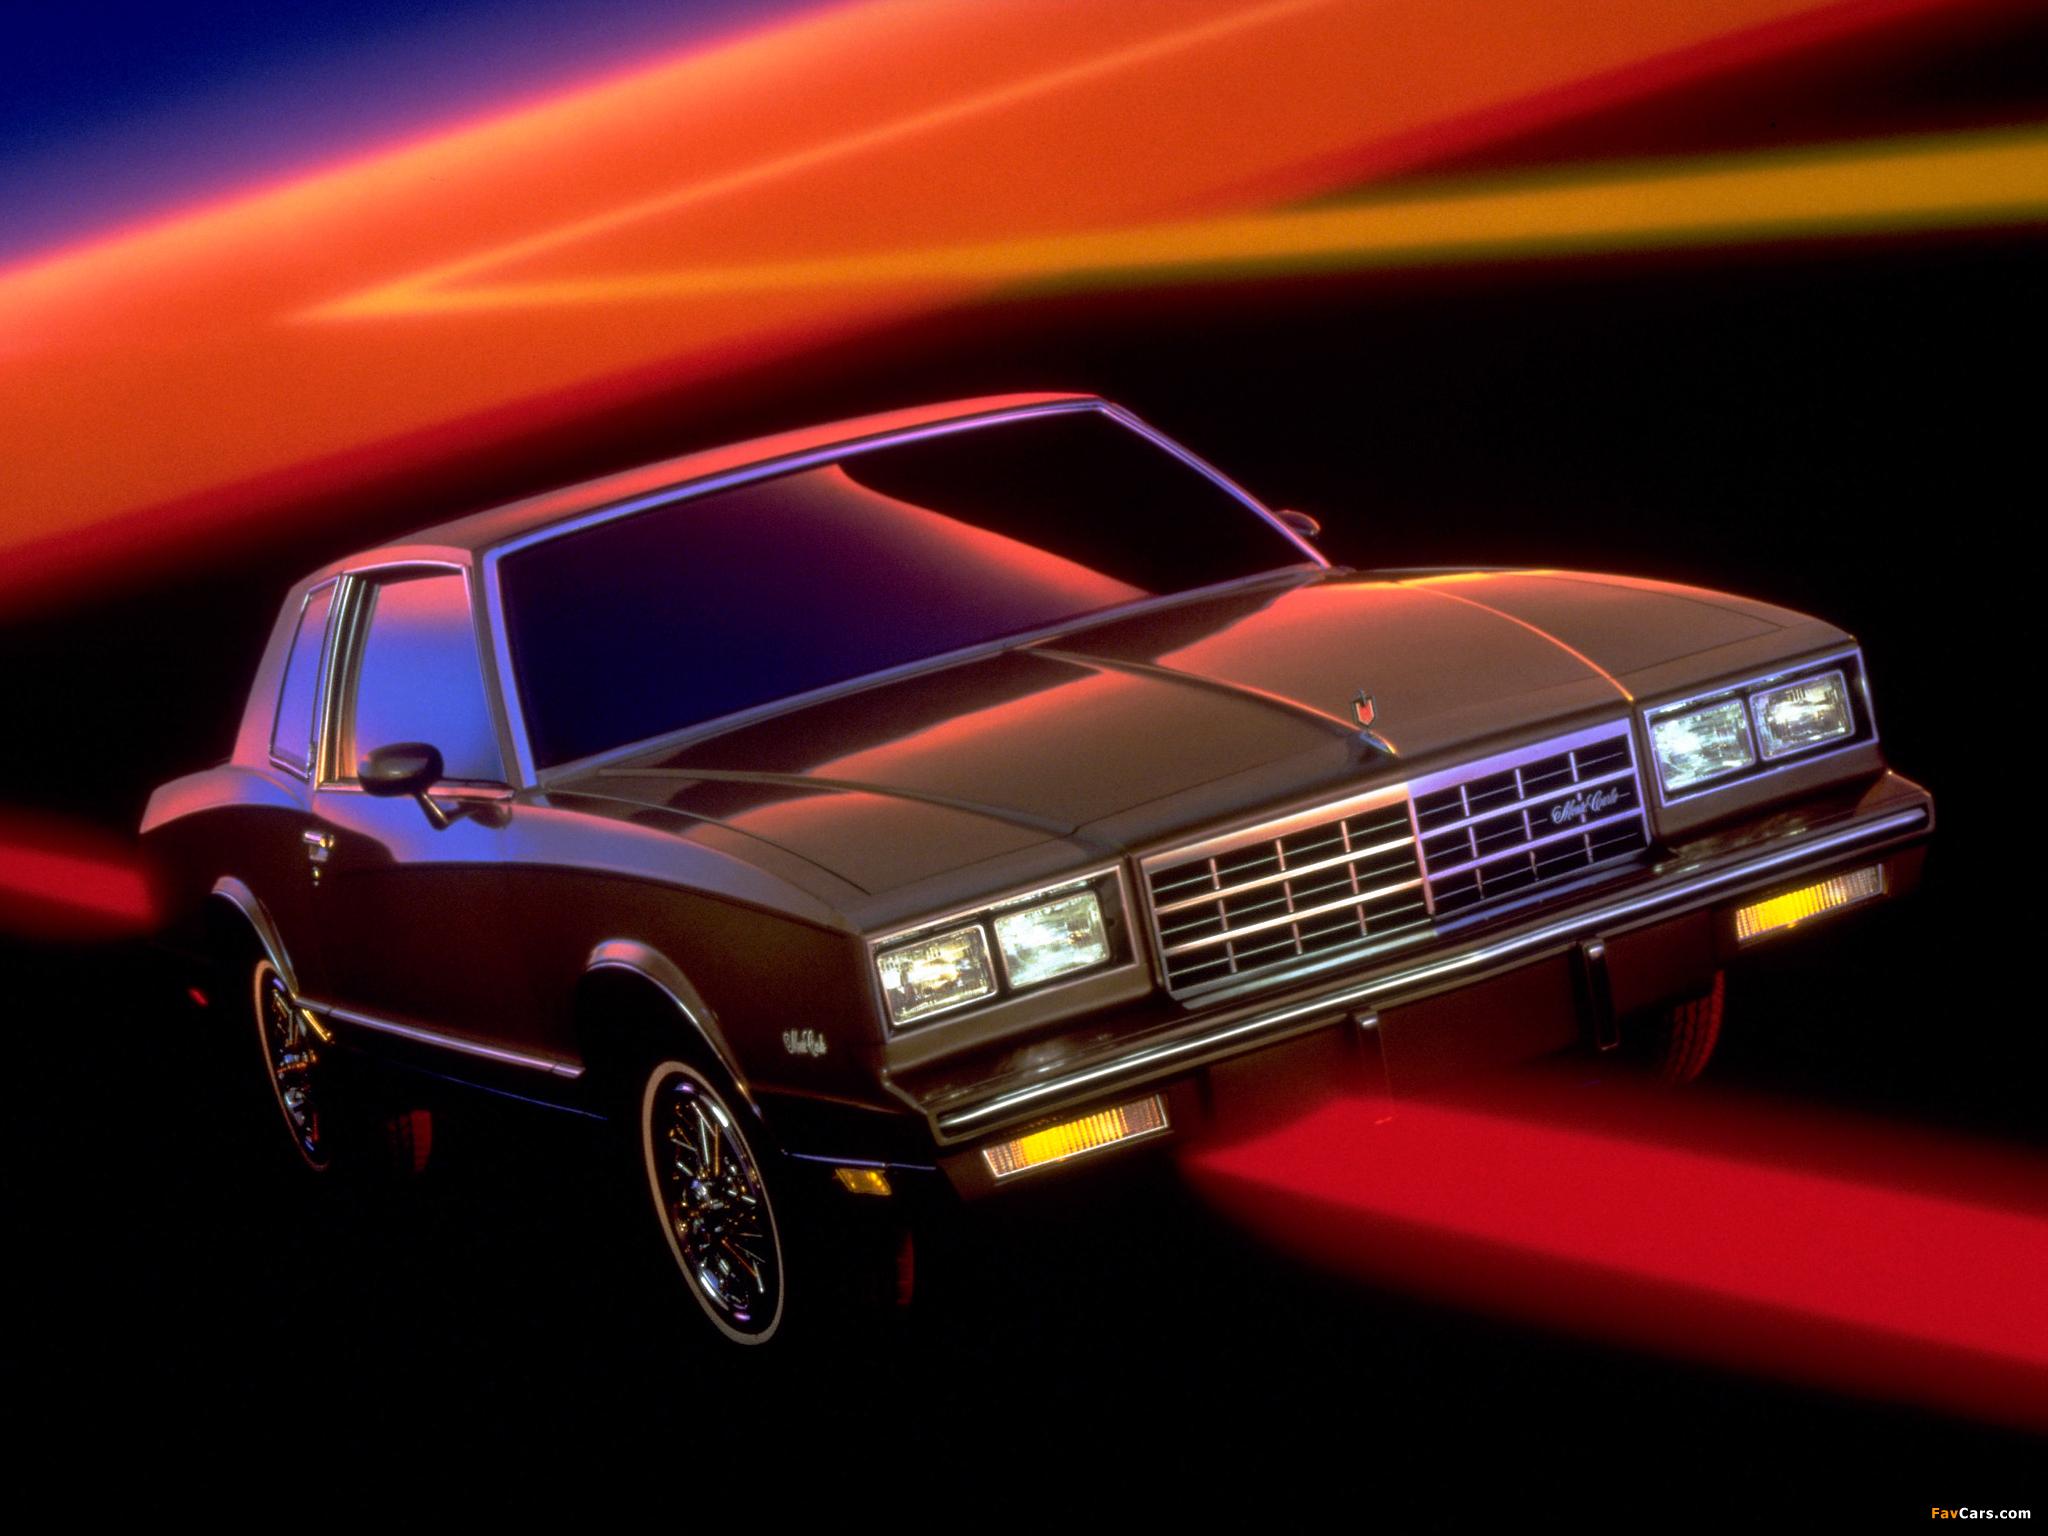 Chevrolet monte carlo 1981 85 wallpapers 2048x1536 - Monte carlo movie wallpaper ...